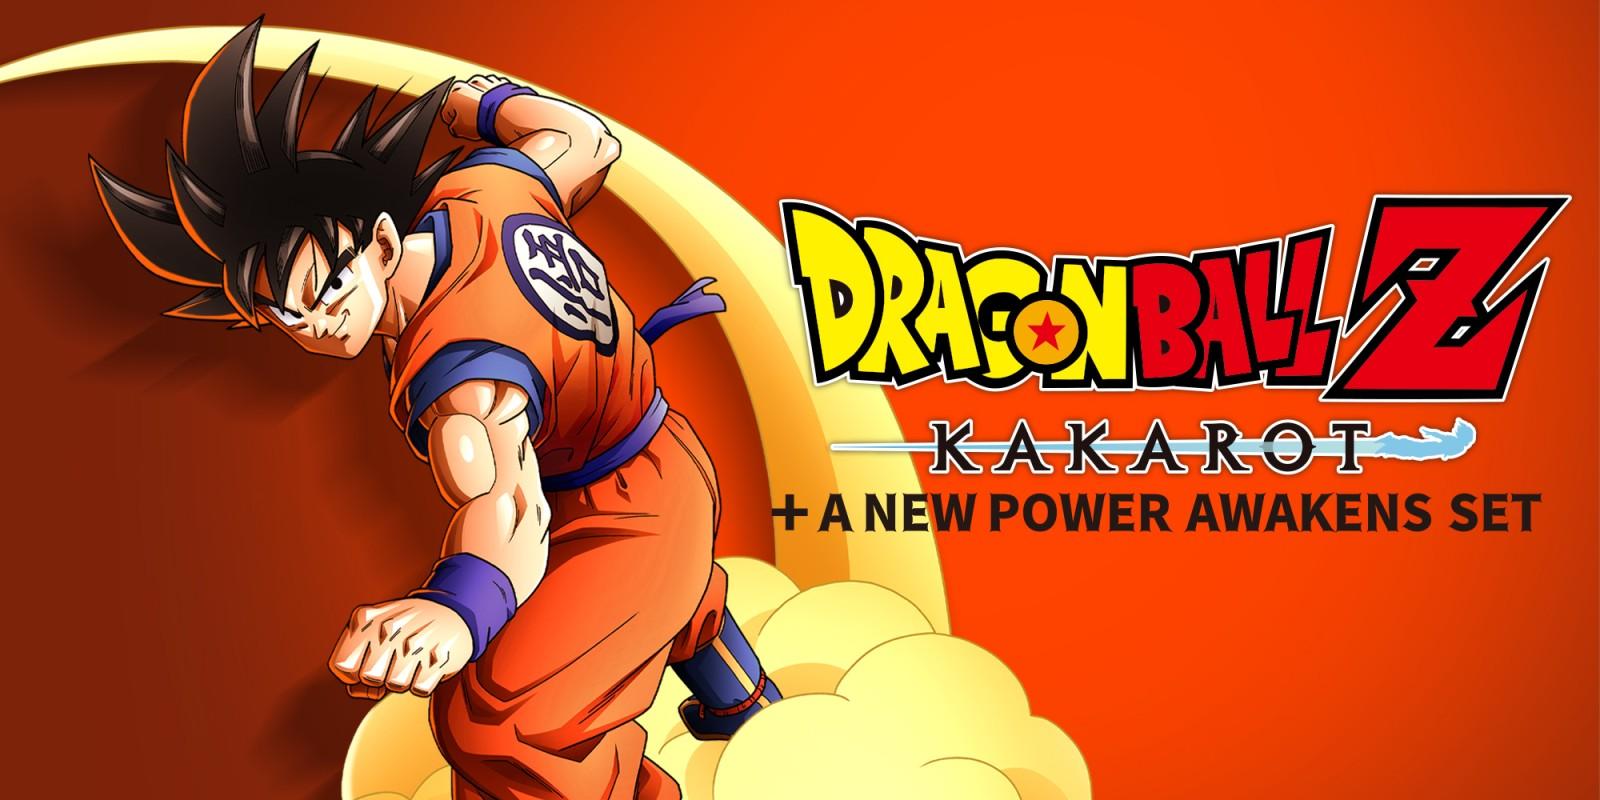 DRAGON BALL Z: KAKAROT + A NEW POWER AWAKENS SET DISPONIBILE